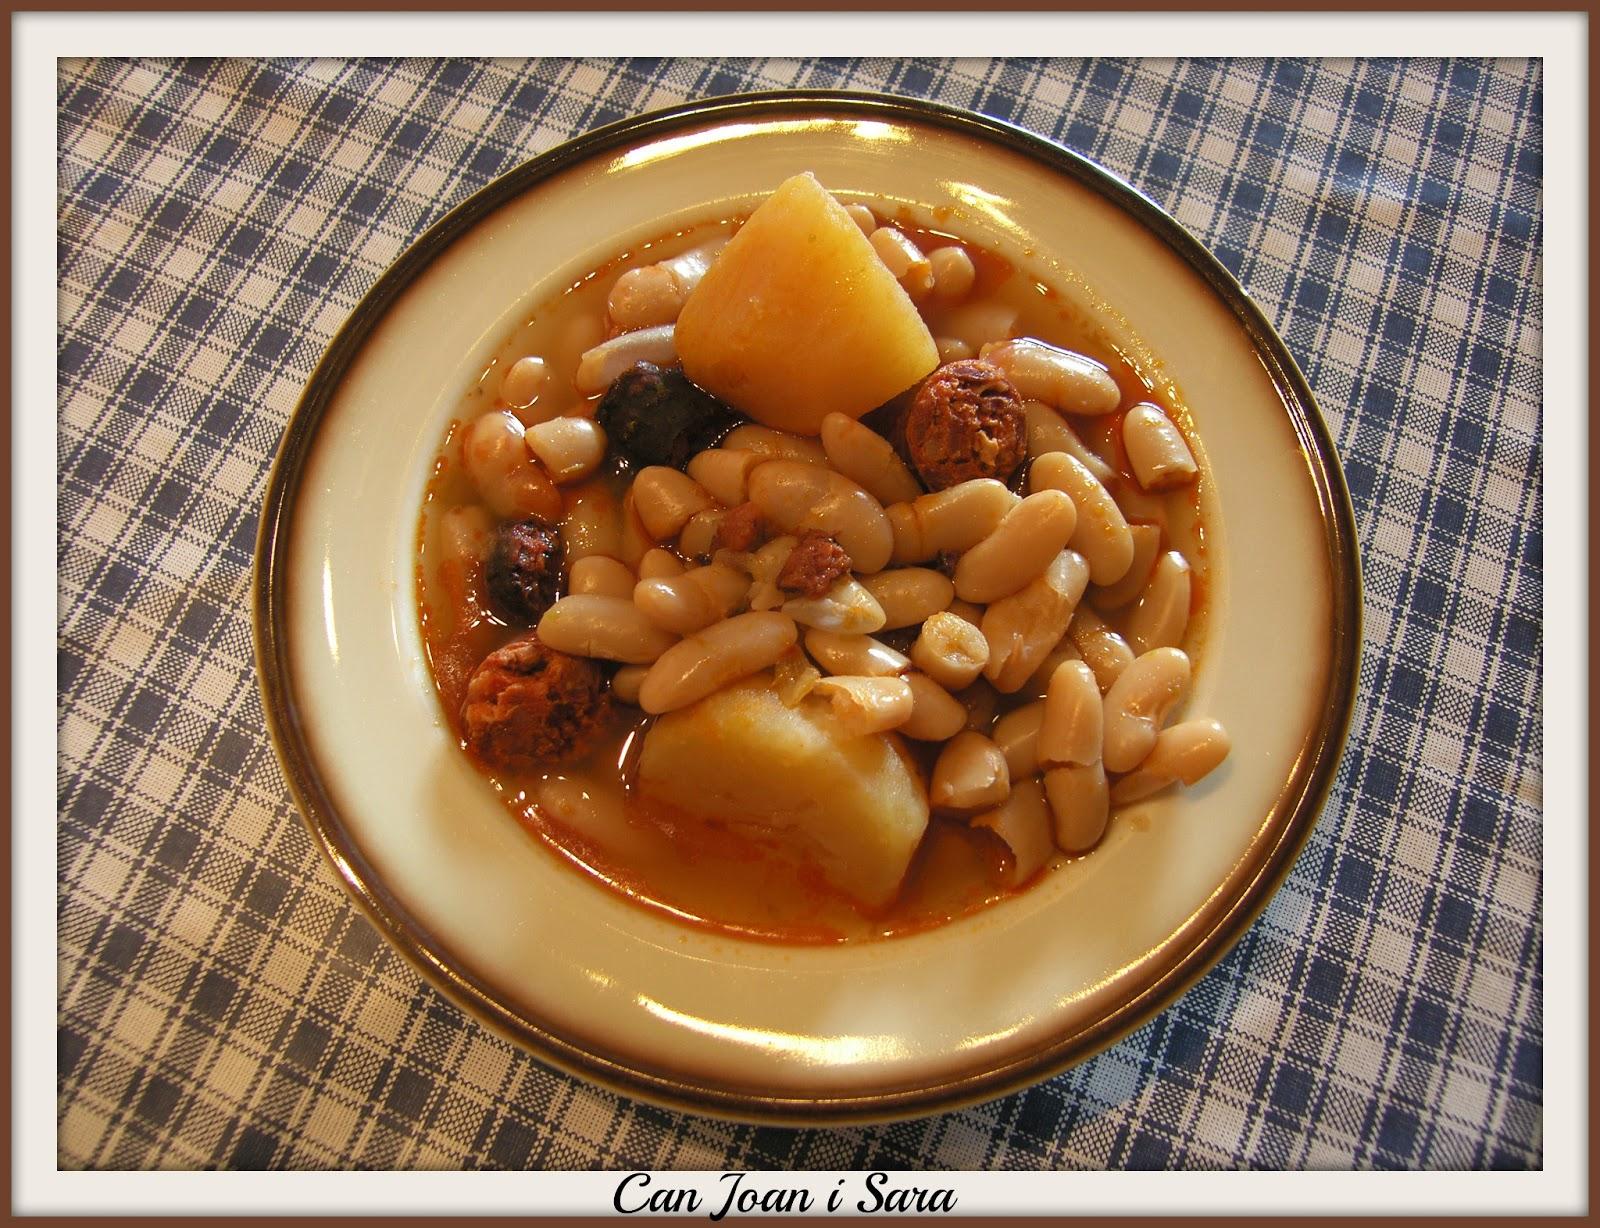 Alubias estofadas en olla express recetas de cocina - Judias verdes en olla express ...